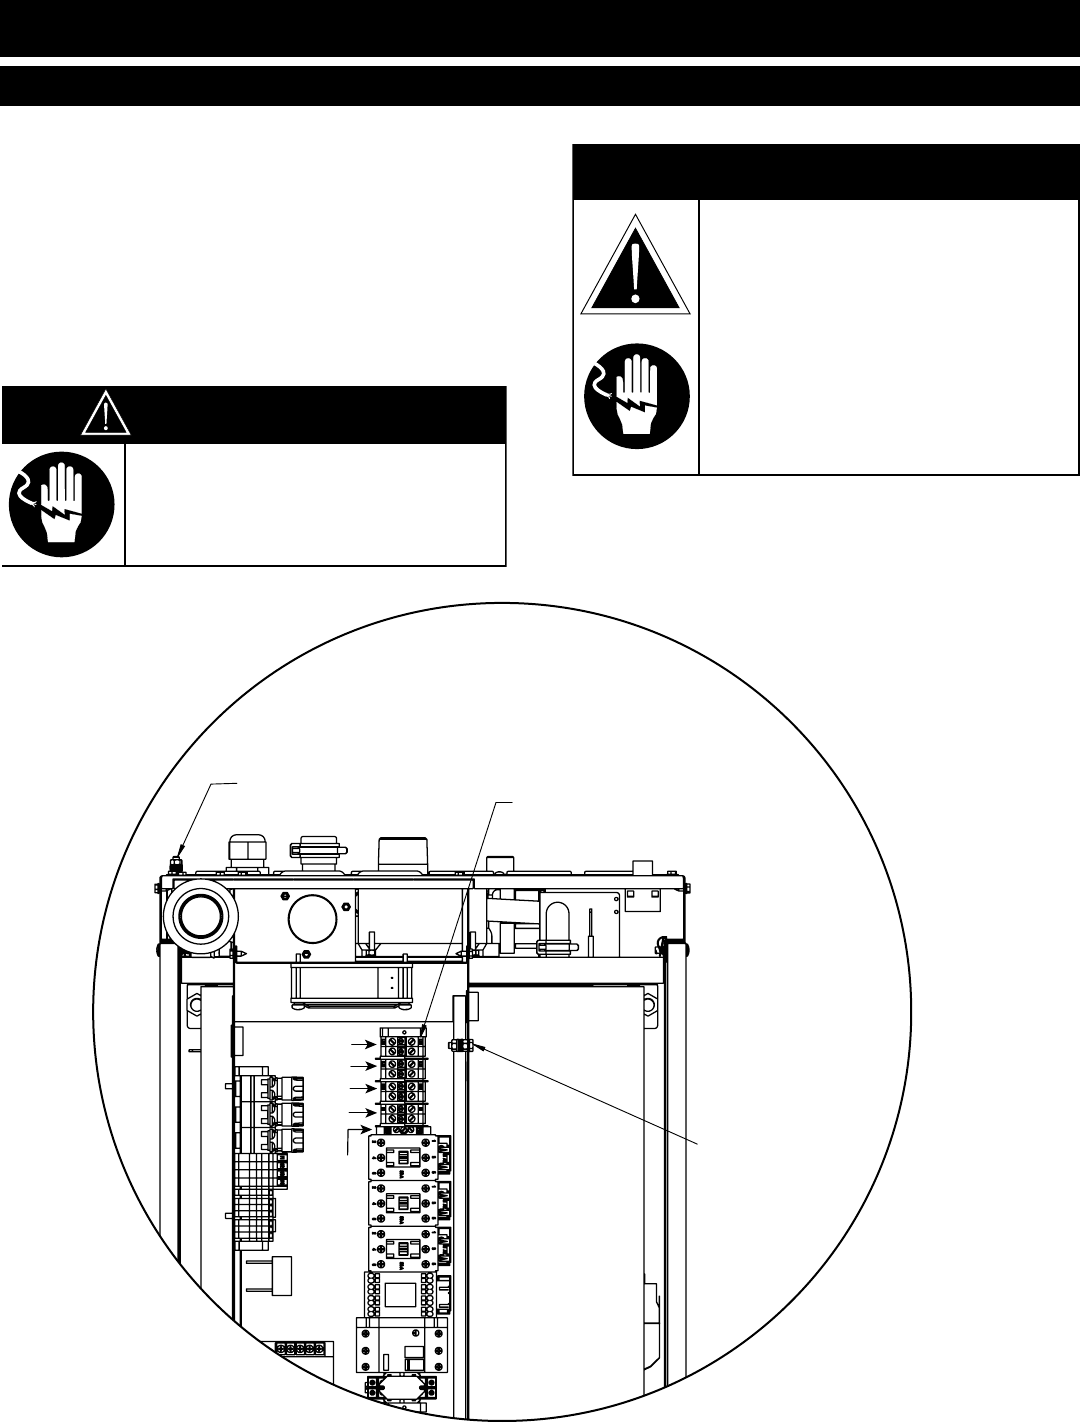 Alto Shaam 4 10esi Users Manual Wiring Diagram Installation 11